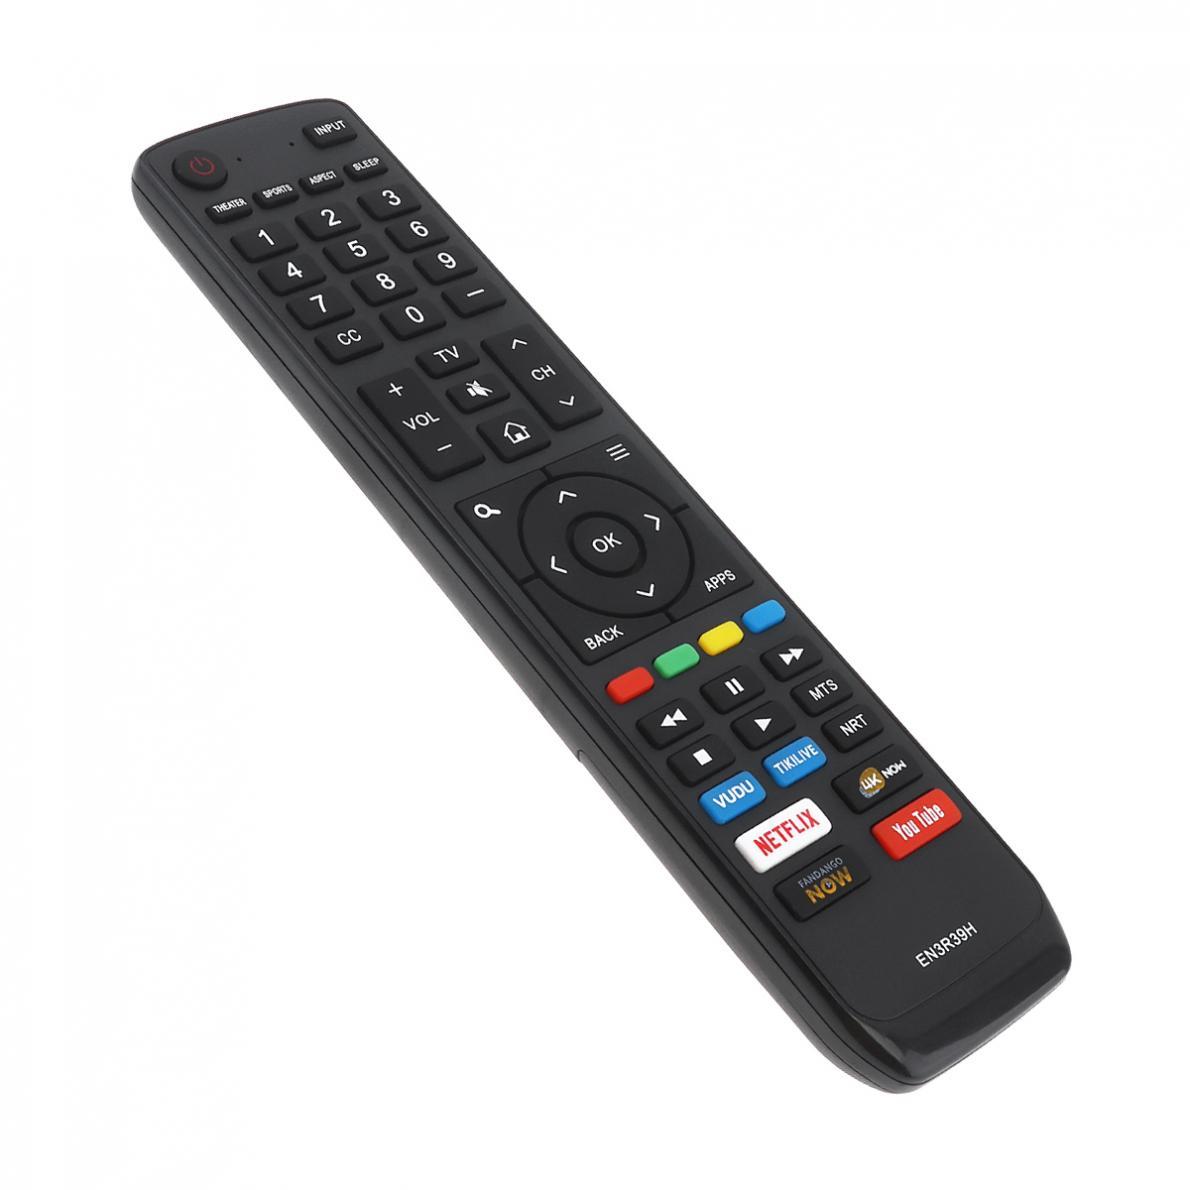 Calvas projector remote control for Viewsonic PJD6241 controller